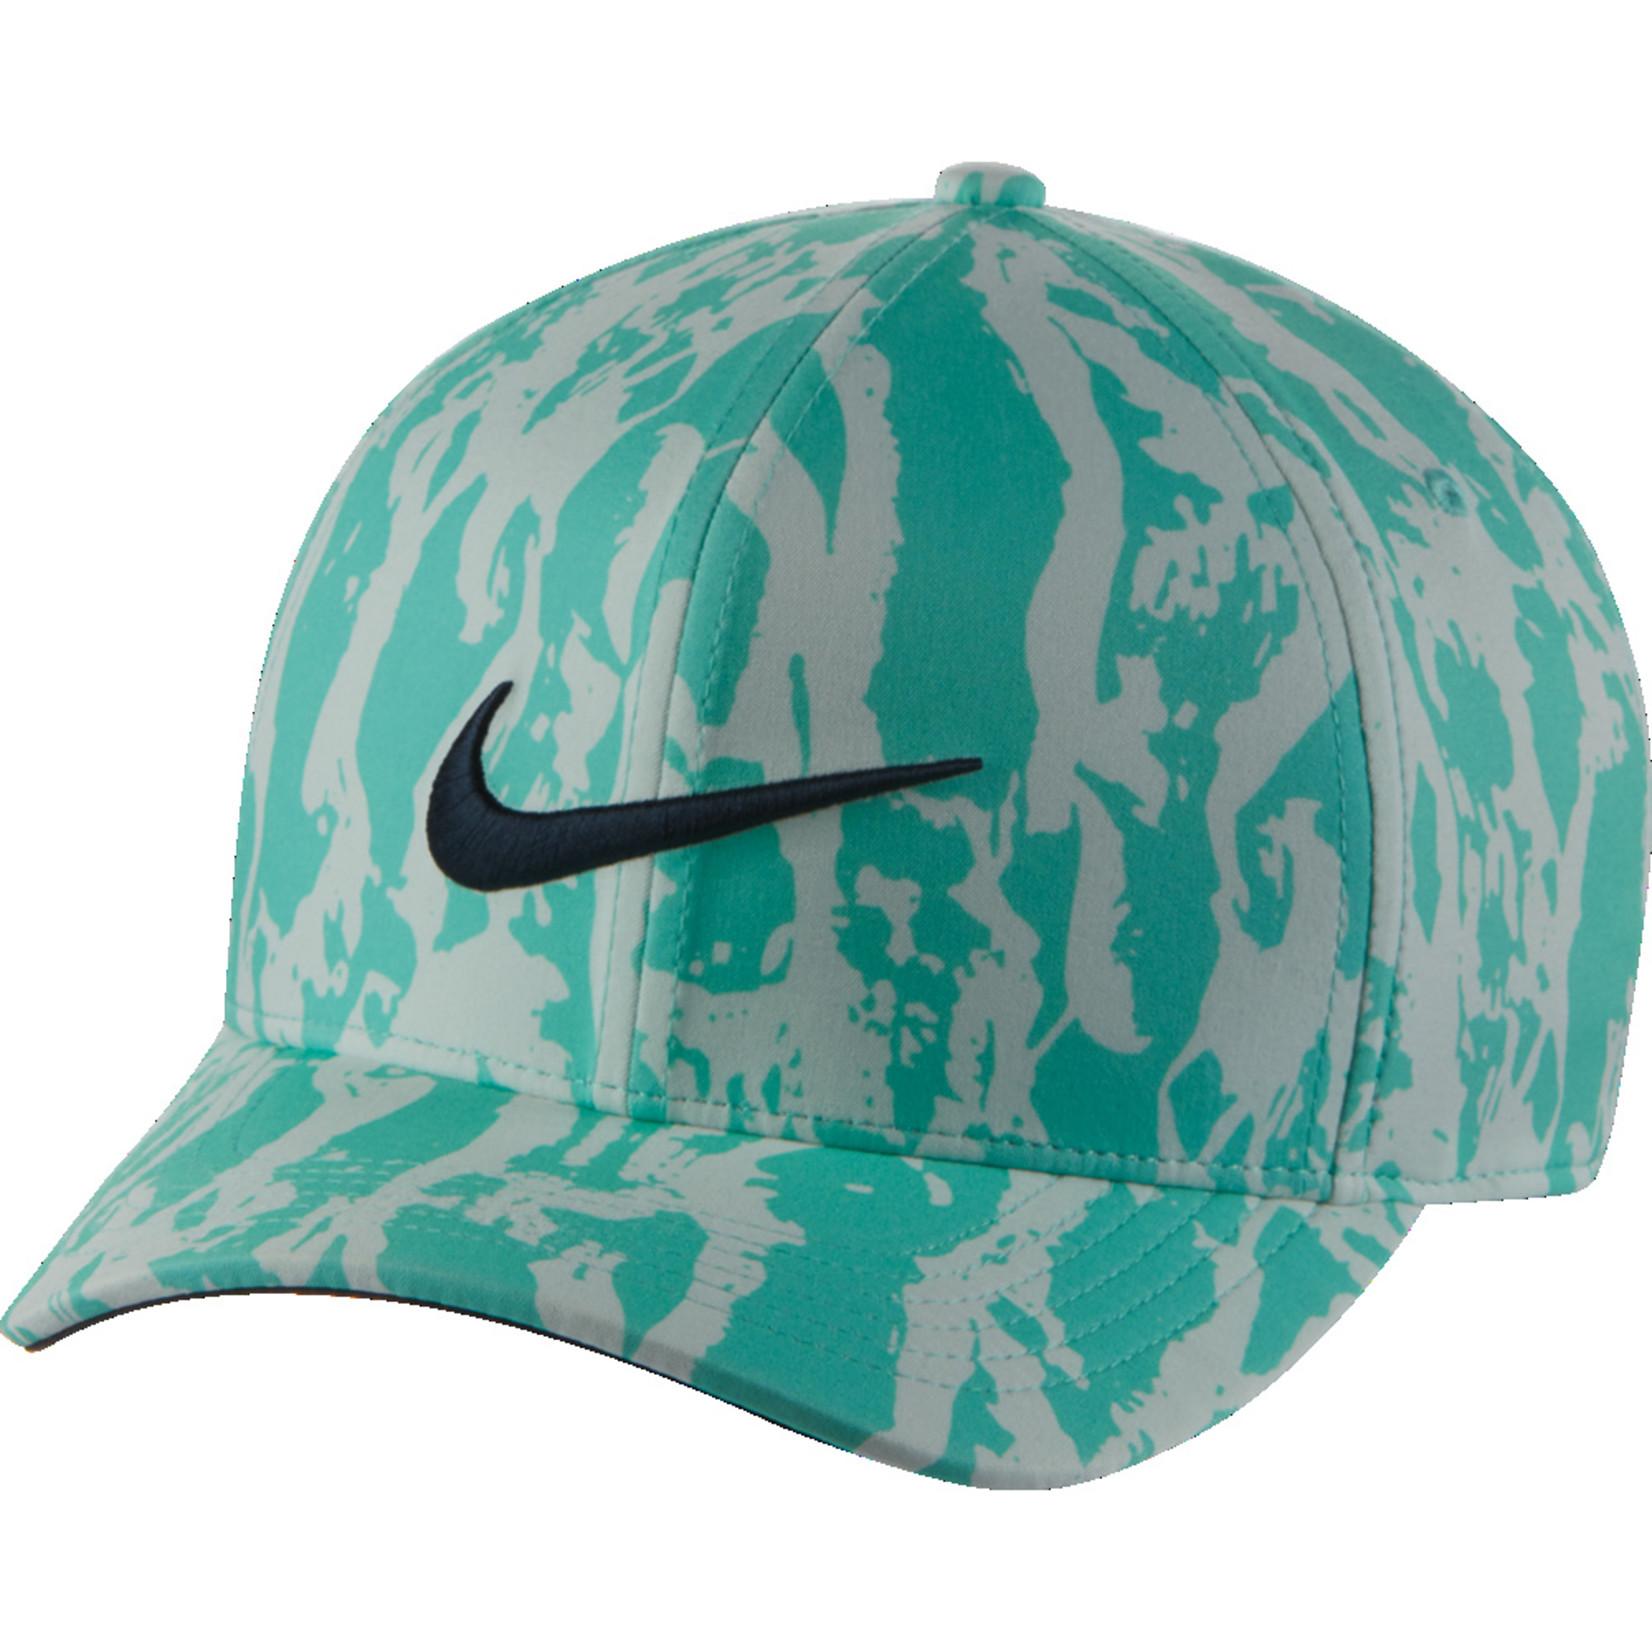 Nike Nike AeroBill Classic99 Printed Hat (21)